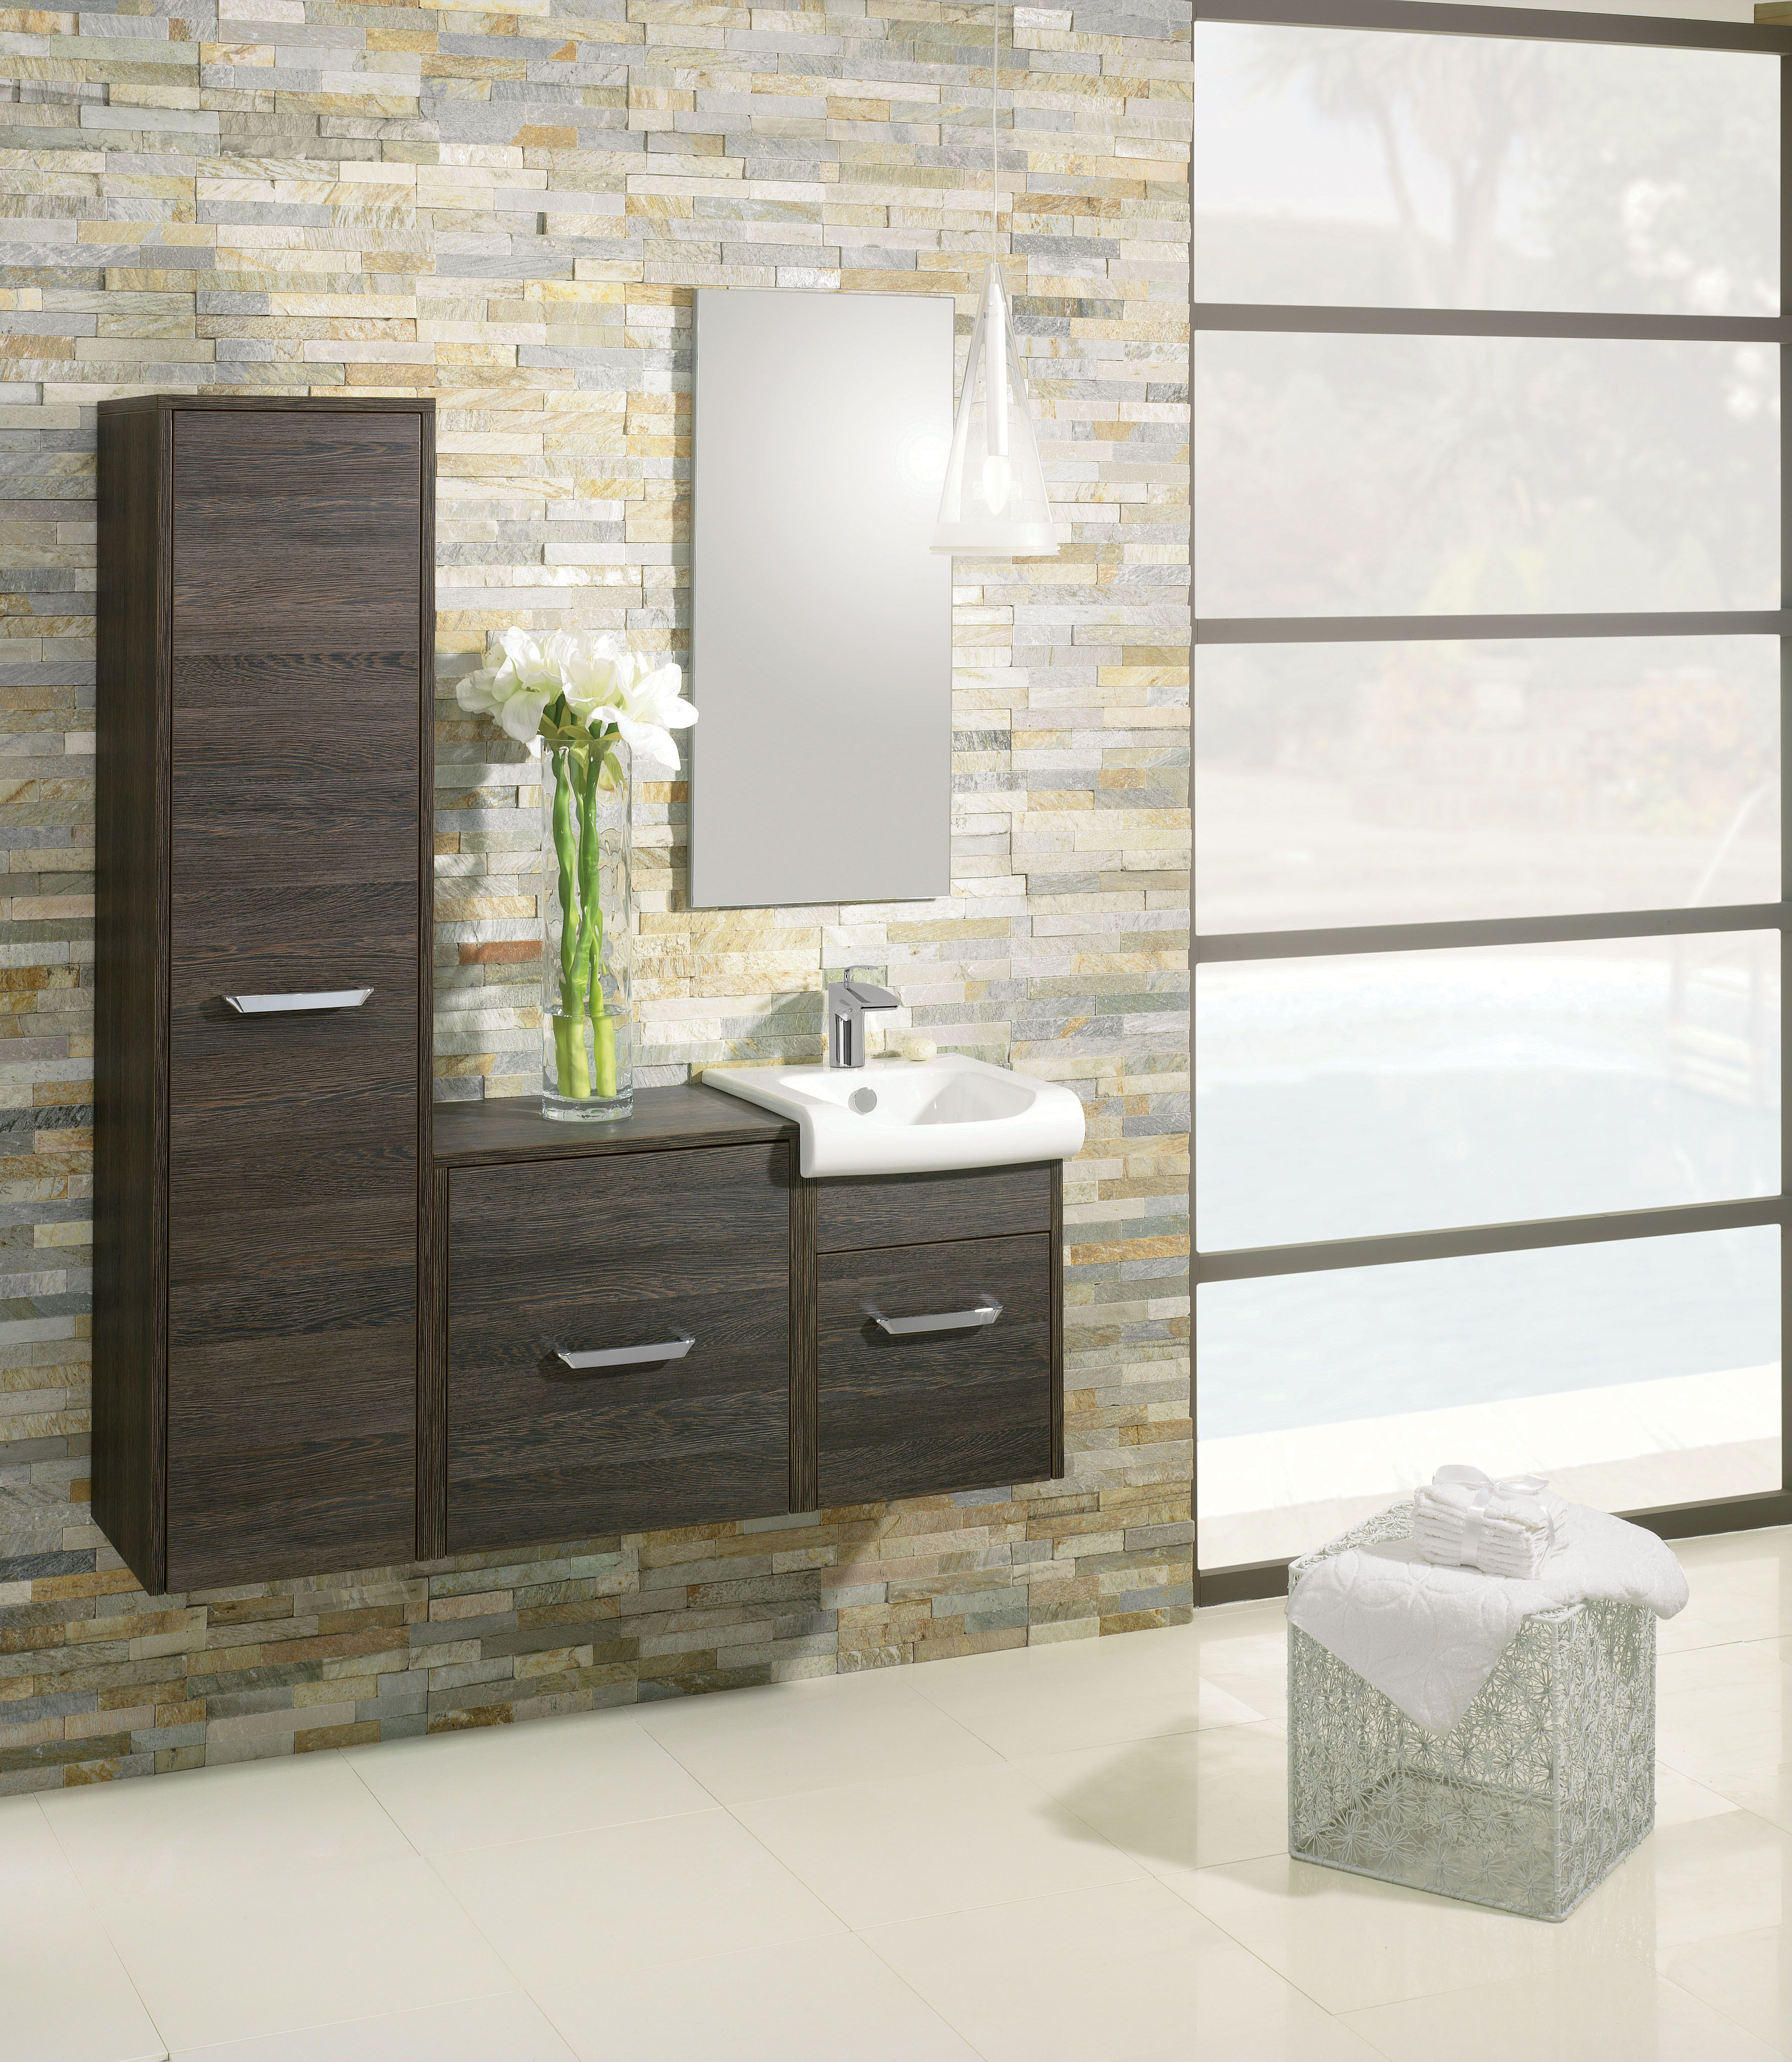 Essence Ebony Bathroom Furniture Range From Crosswater Http Www Bauhaus Bathrooms Co Uk Category Bauhaus Fur